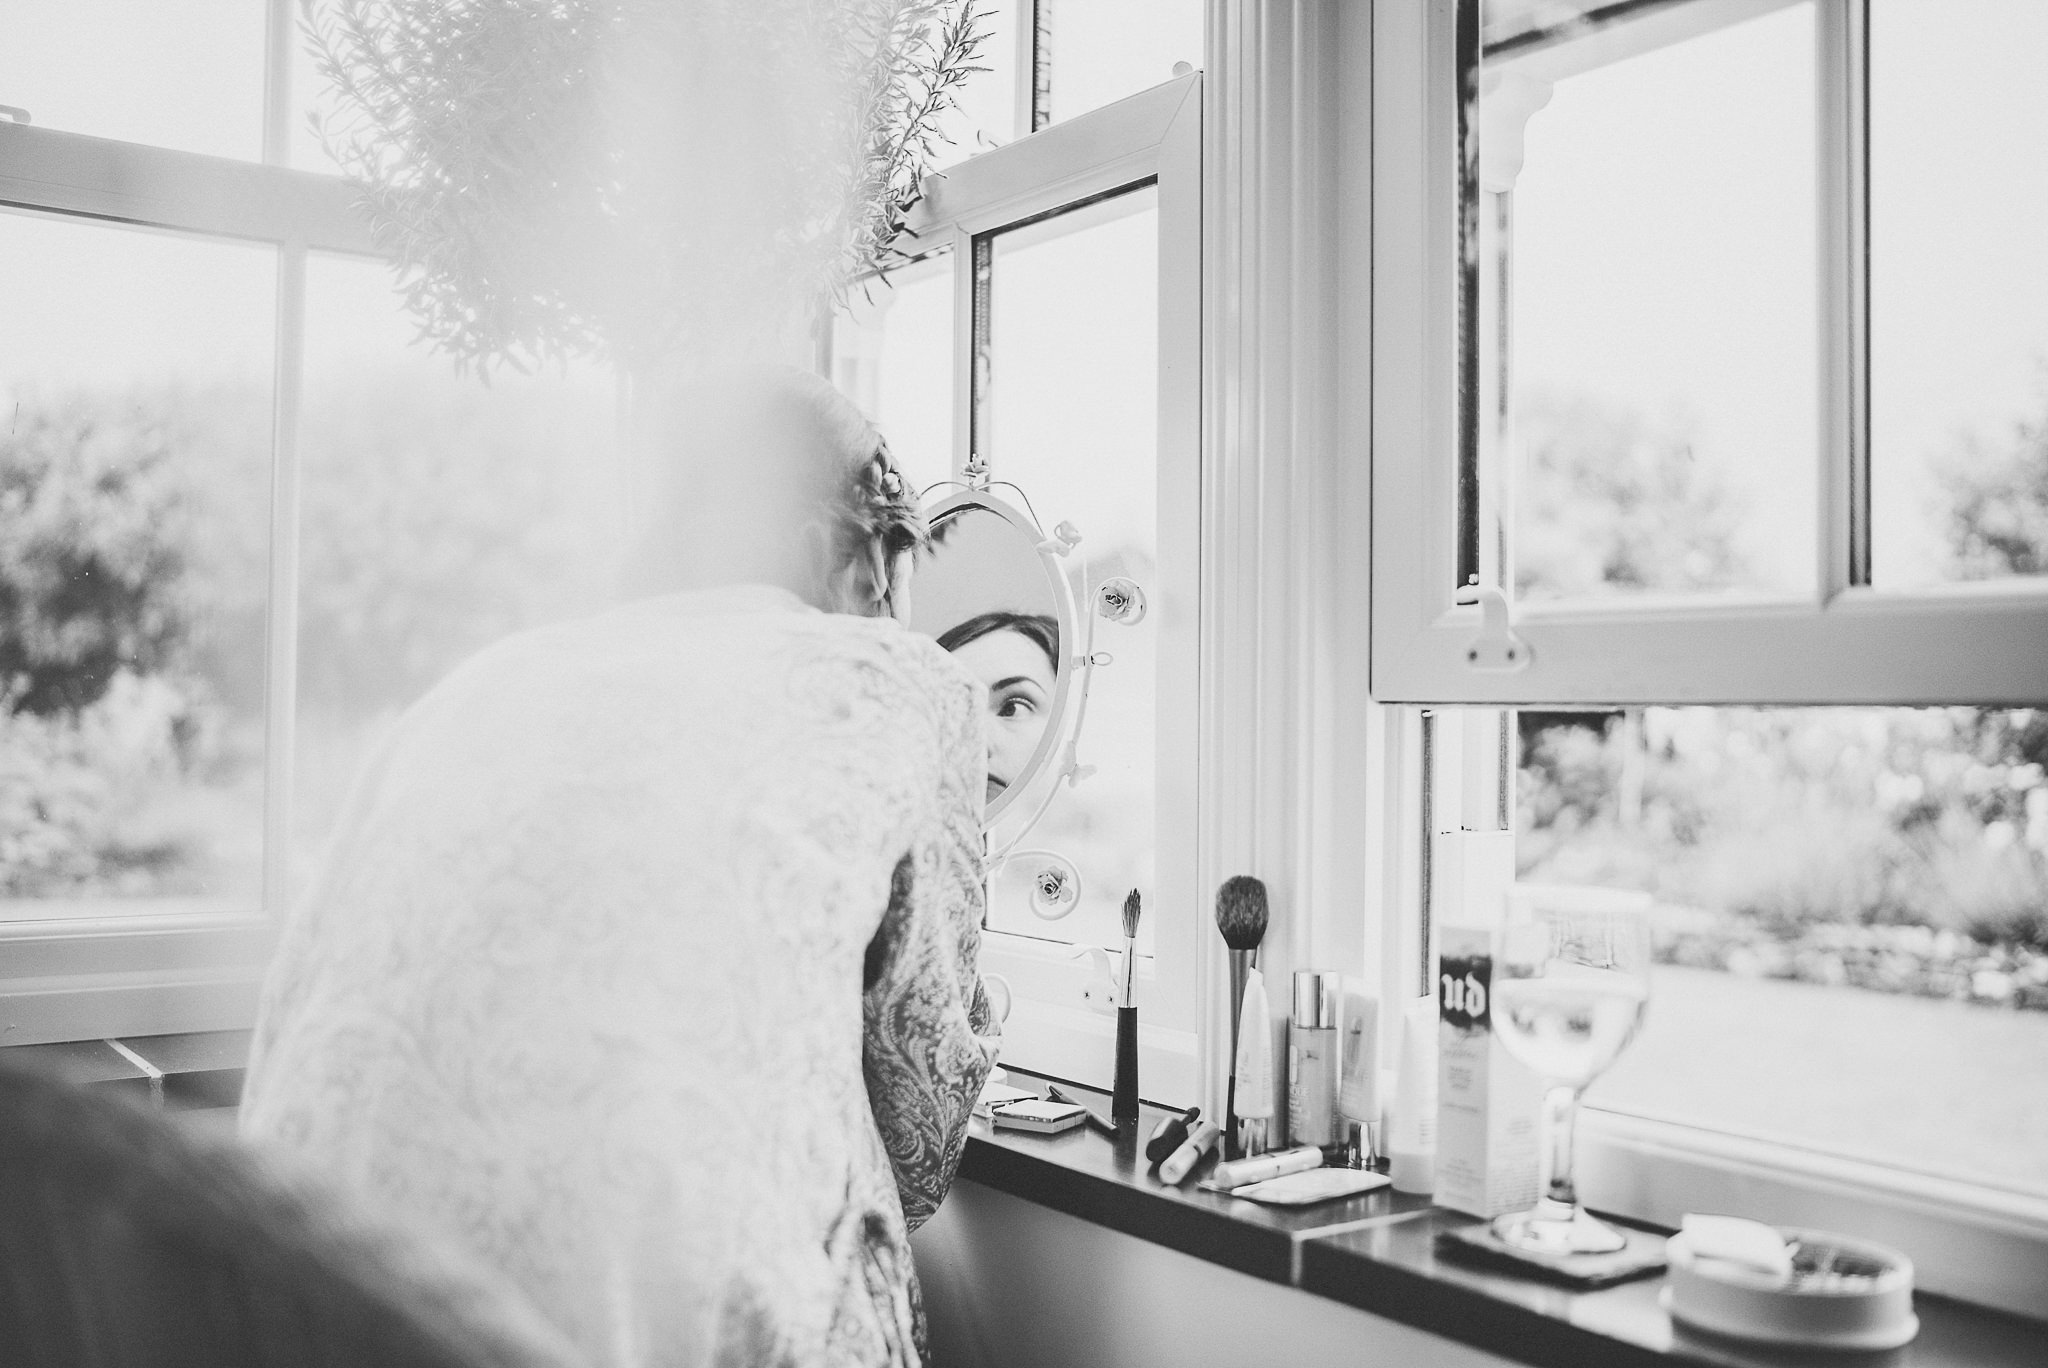 paul-marbrook-Farm-Wedding-Photographer-Lancashire-90003